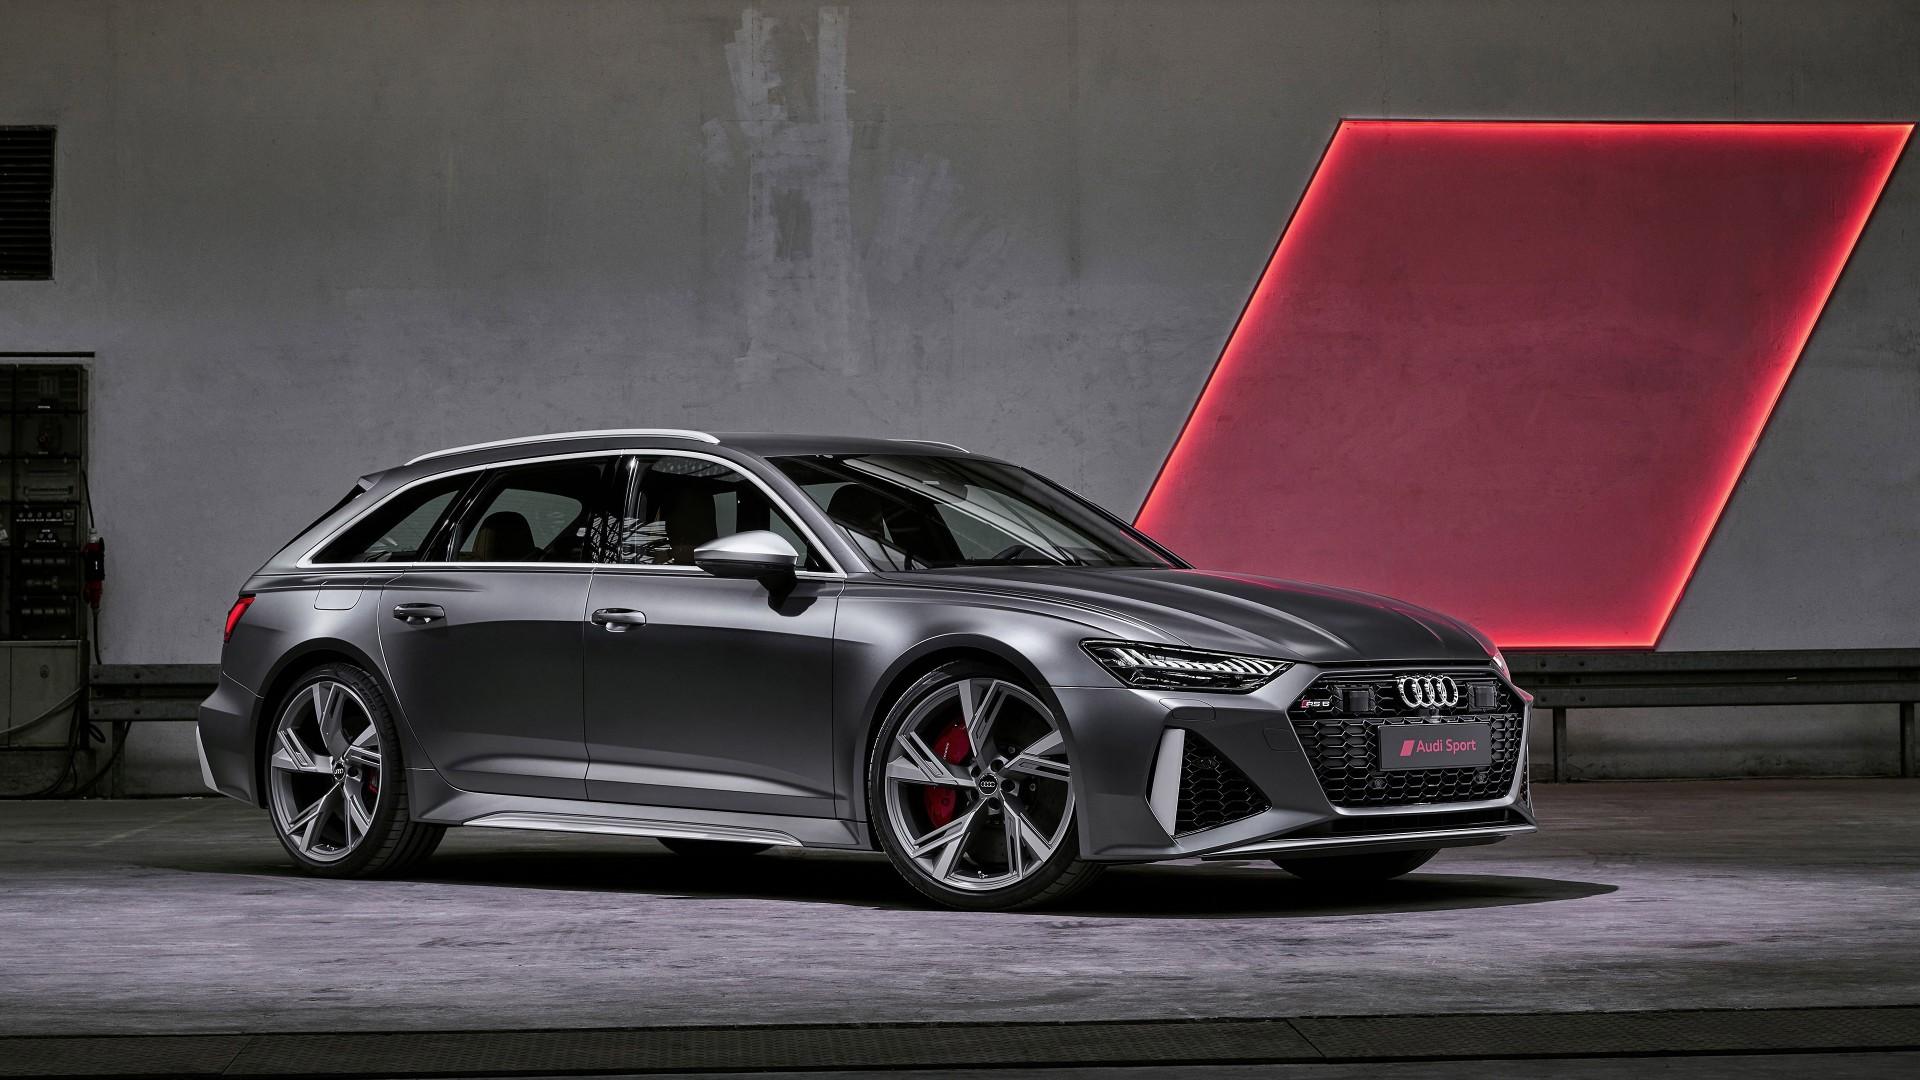 2020 Audi RS6 Avant 4K Wallpaper | HD Car Wallpapers | ID ...